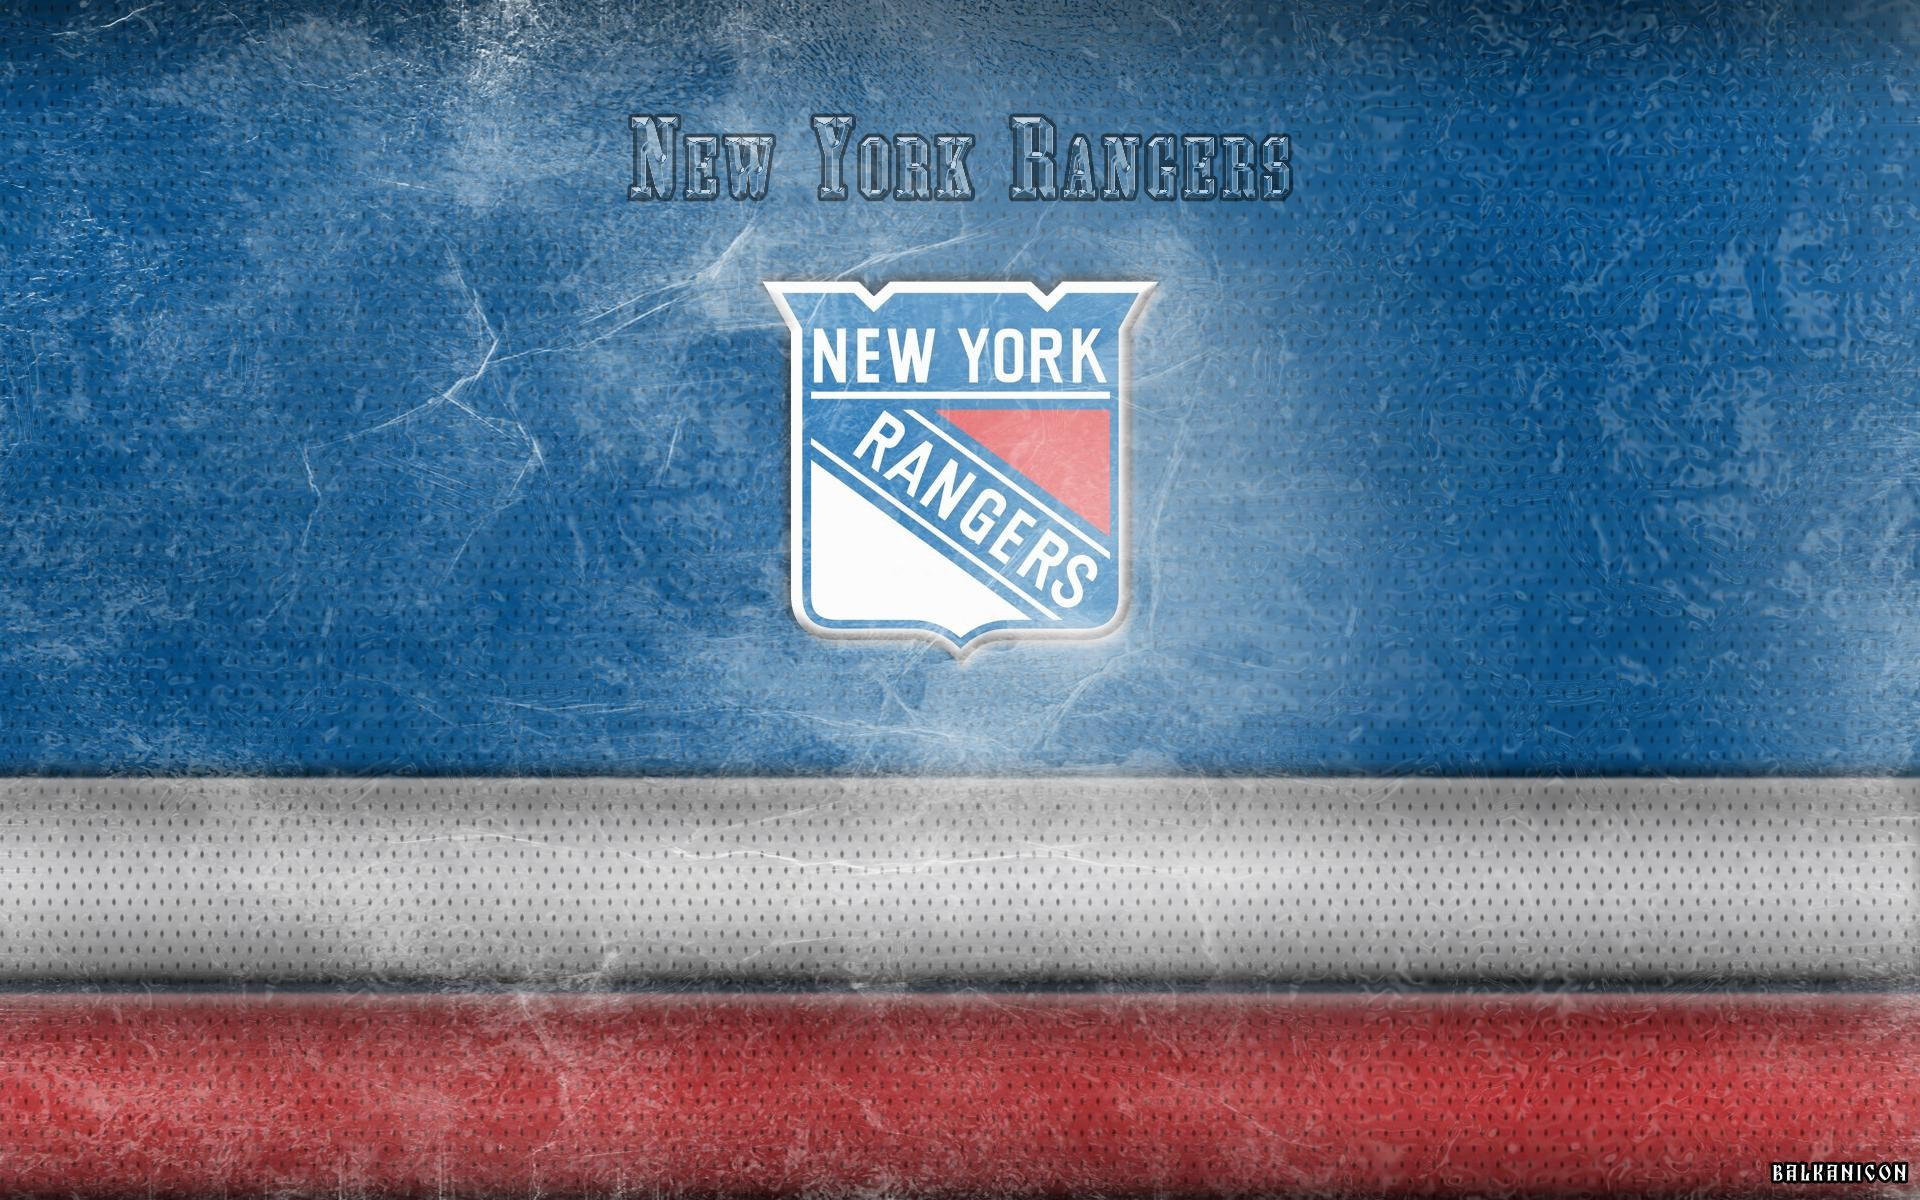 New-York-Rangers-wallpaper-by-Balkanicon